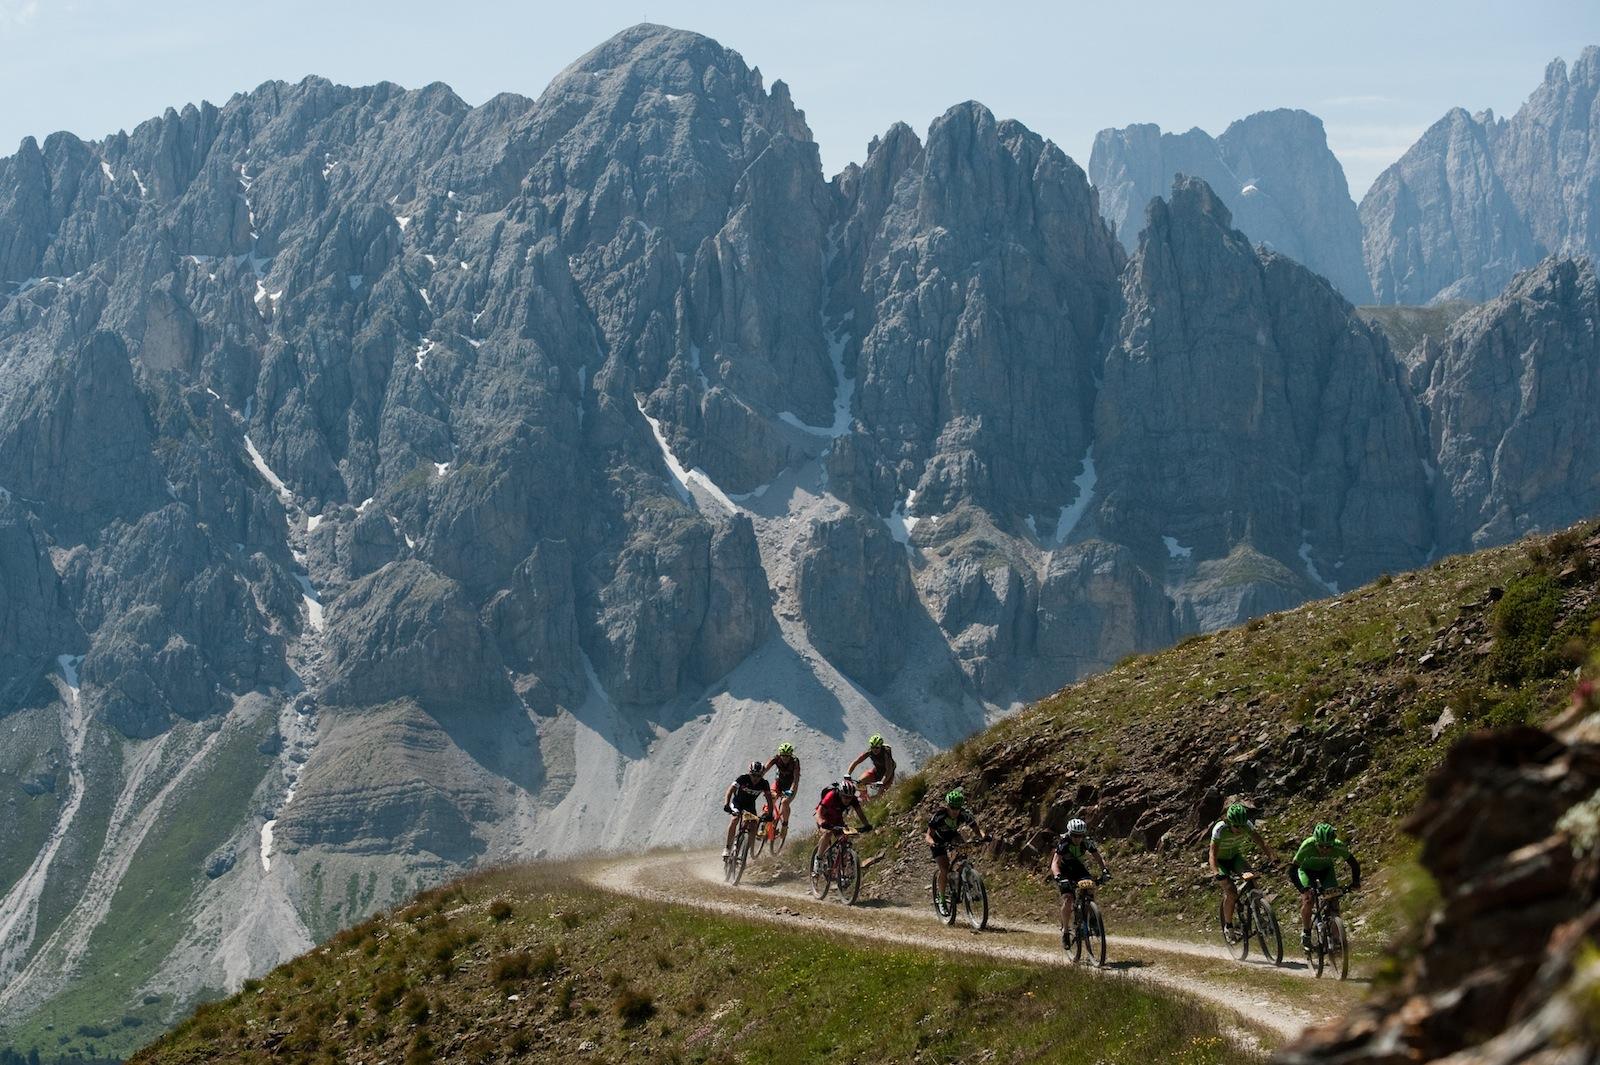 Course_Craft_BIKE_Transalp_powered_by_Sigma_2013_Stage_3_Brixen-St.Vigil__56.92_km__2_833_metres_in_elevation_gain__c__Robert_Niedring-Craft_BIKE_Transalp-4